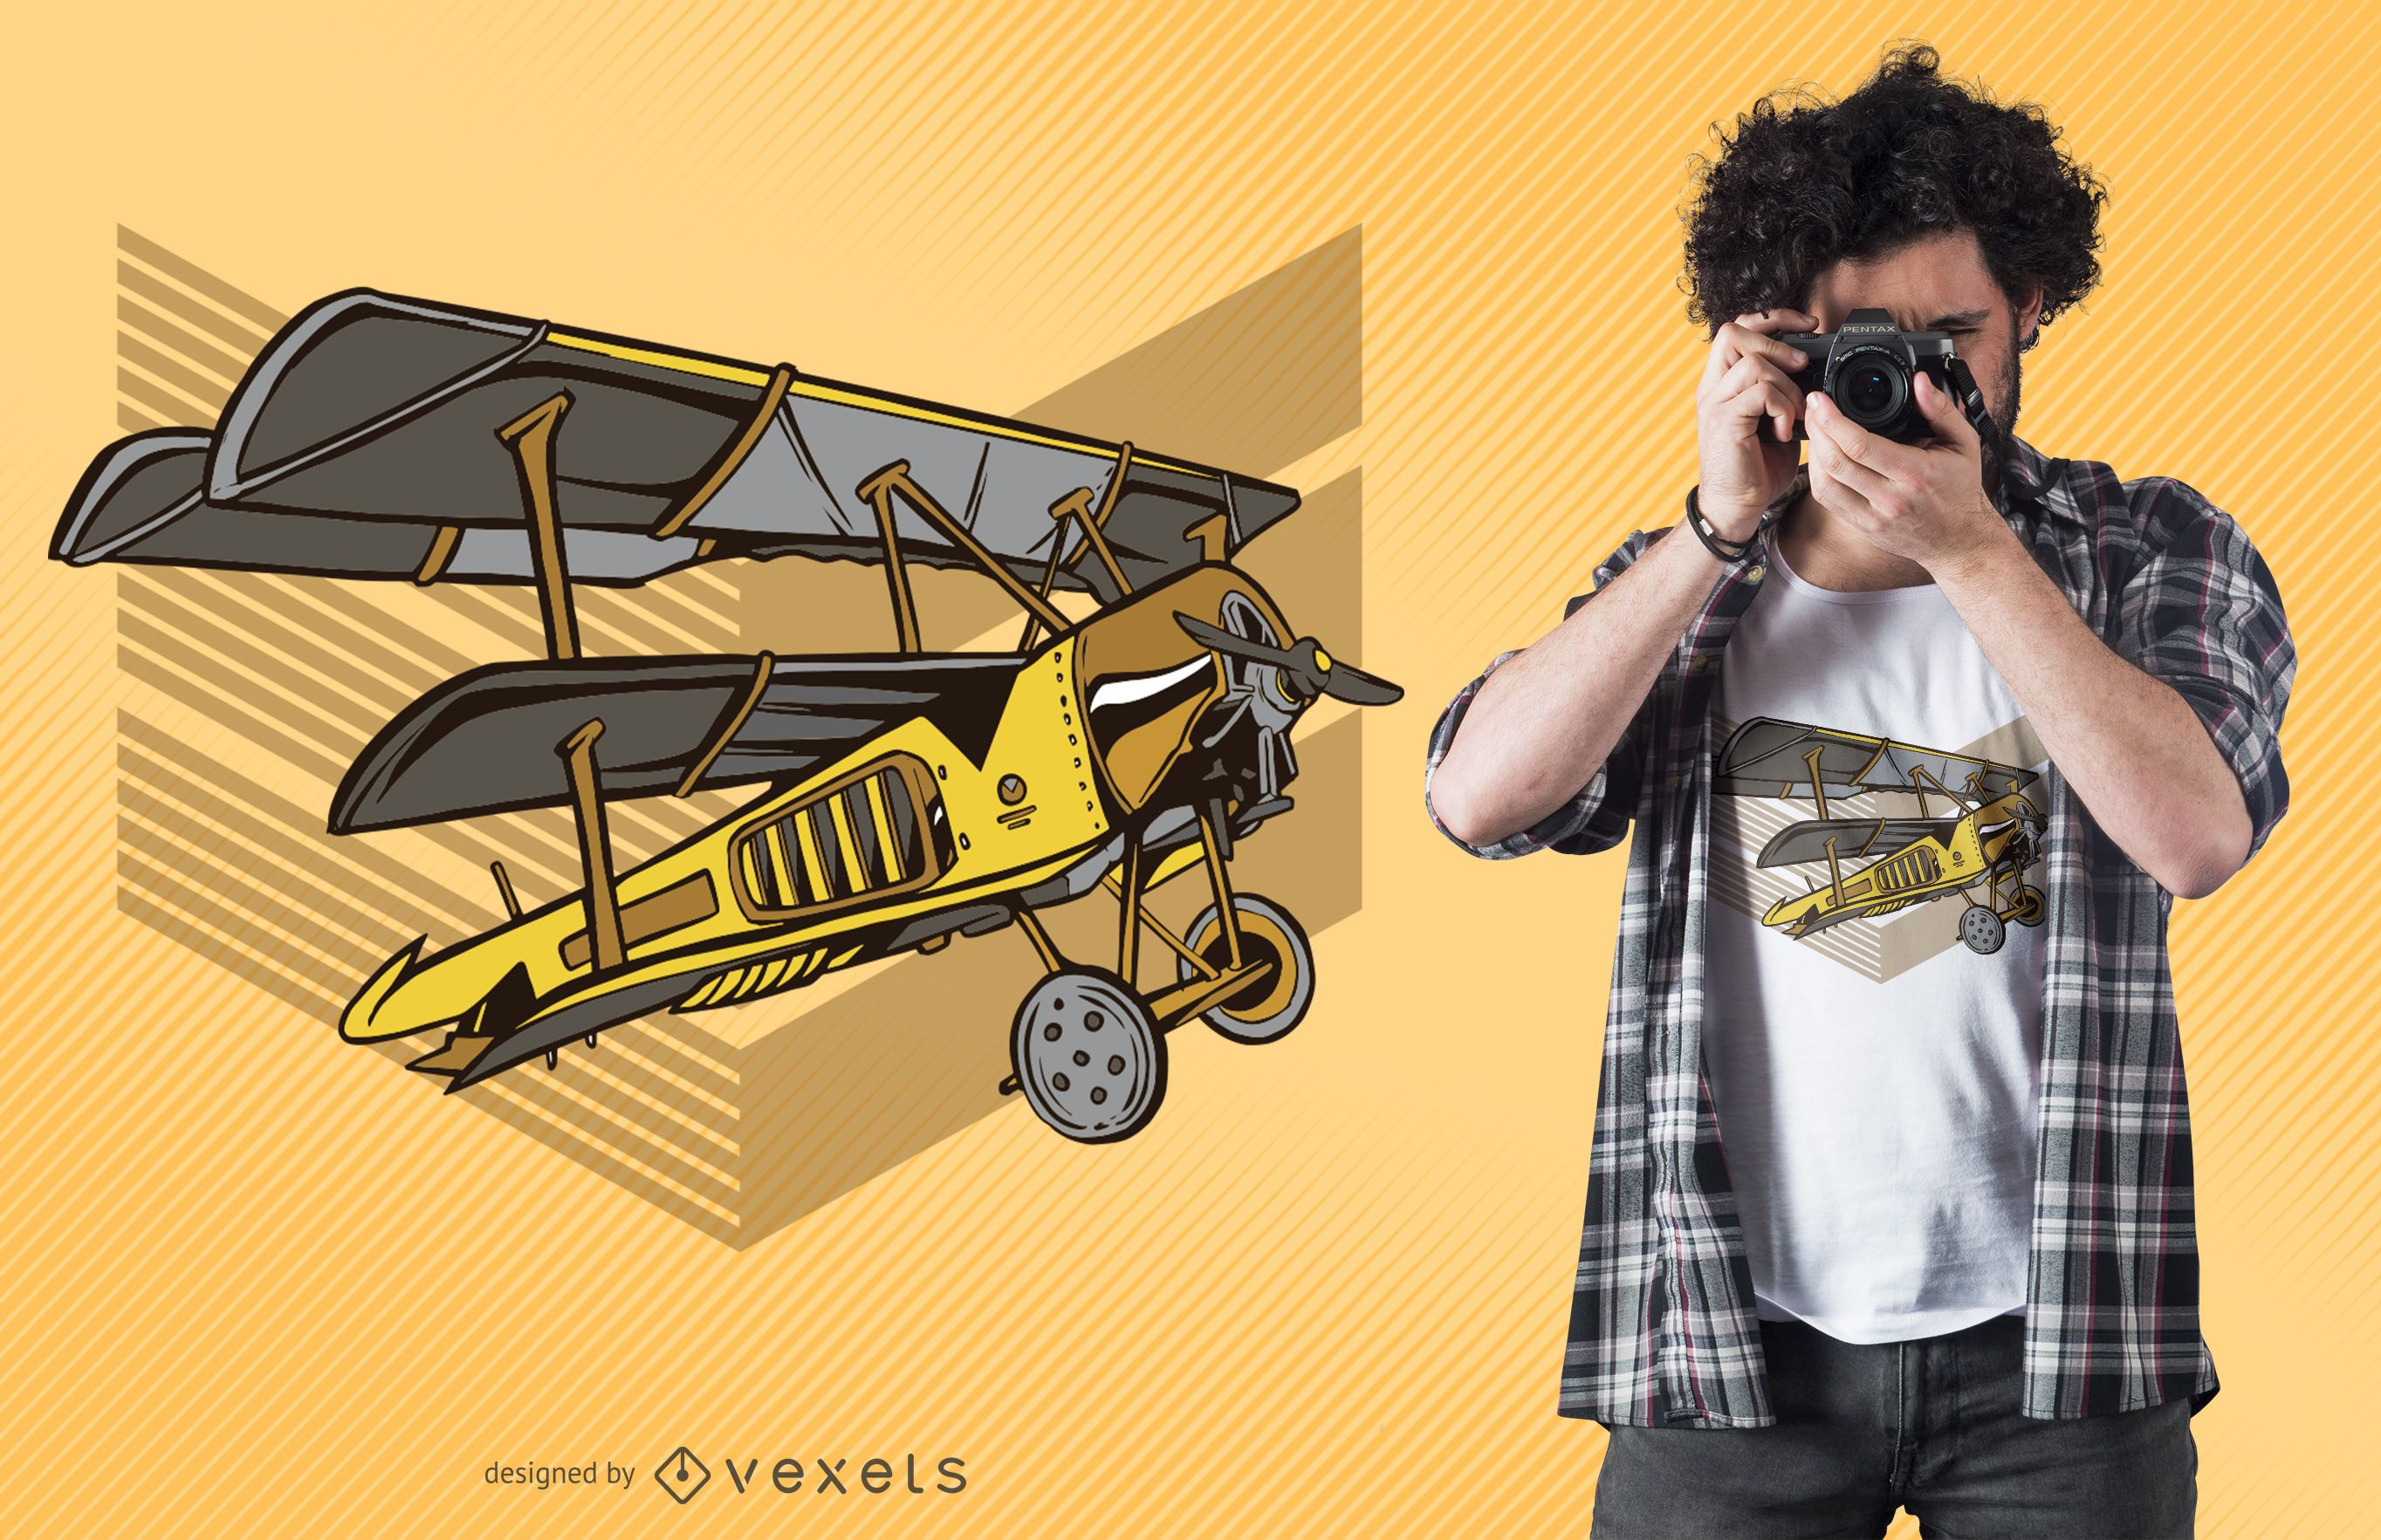 Steampunk plane t-shirt design